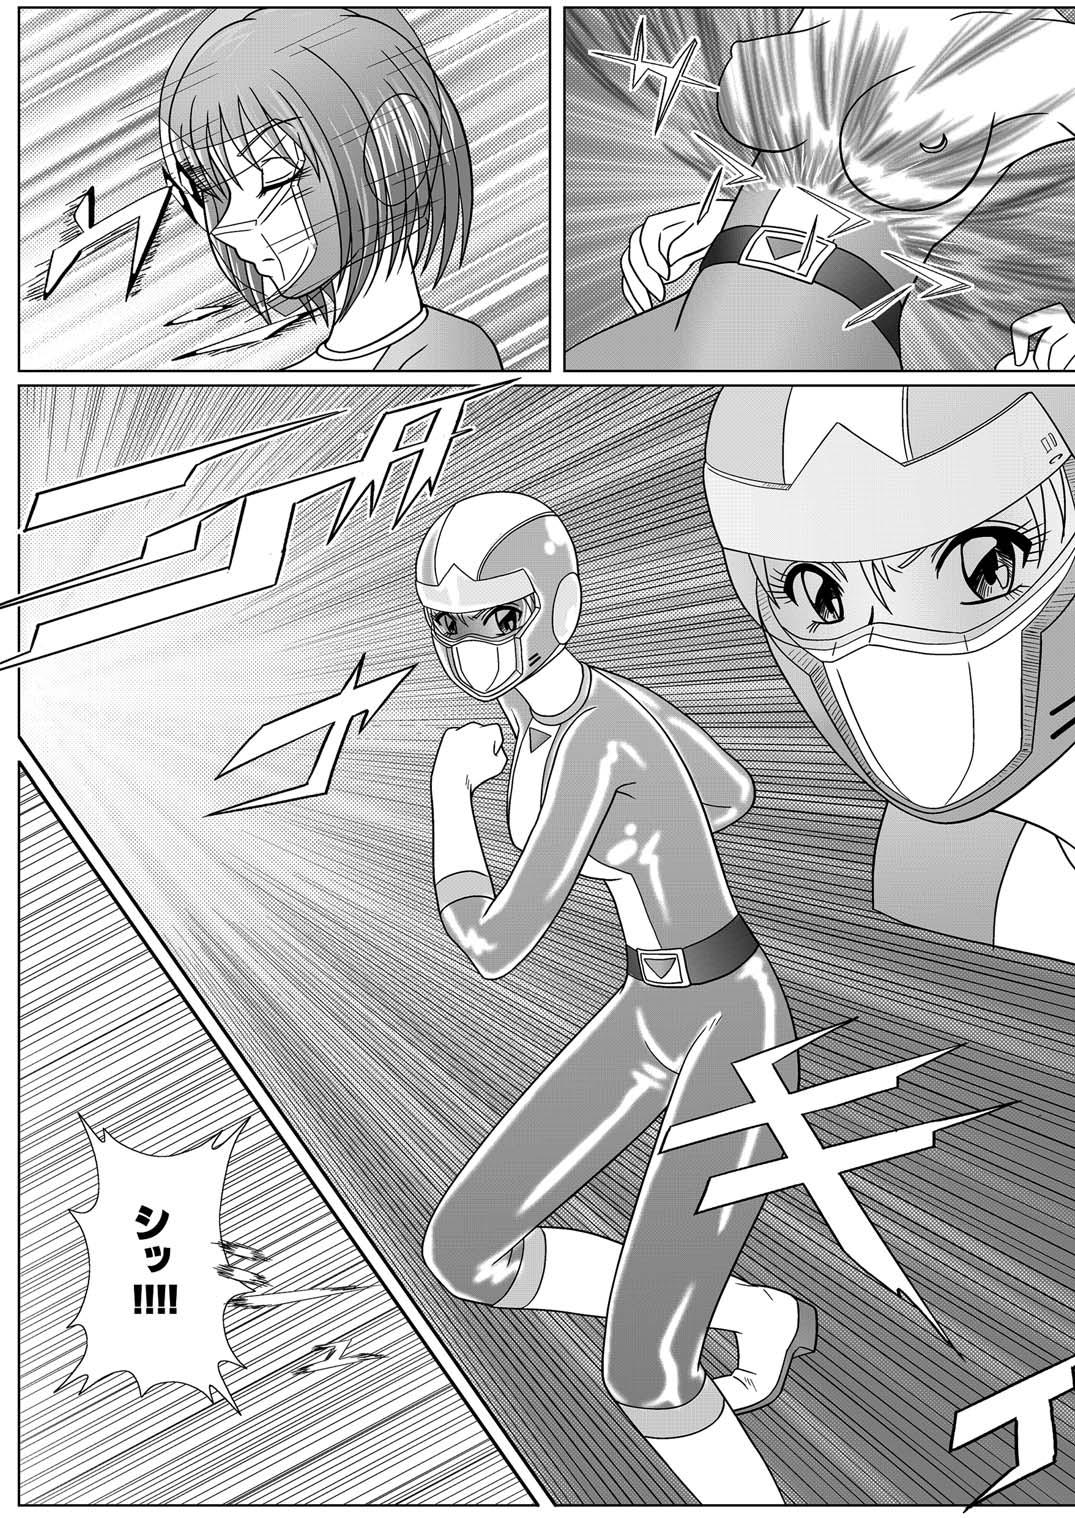 [Macxe's (monmon)] Tokubousentai Dinaranger ~Heroine Kairaku Sennou Keikaku~ Vol.01/02/03 (Renkaban) [Digital] 13